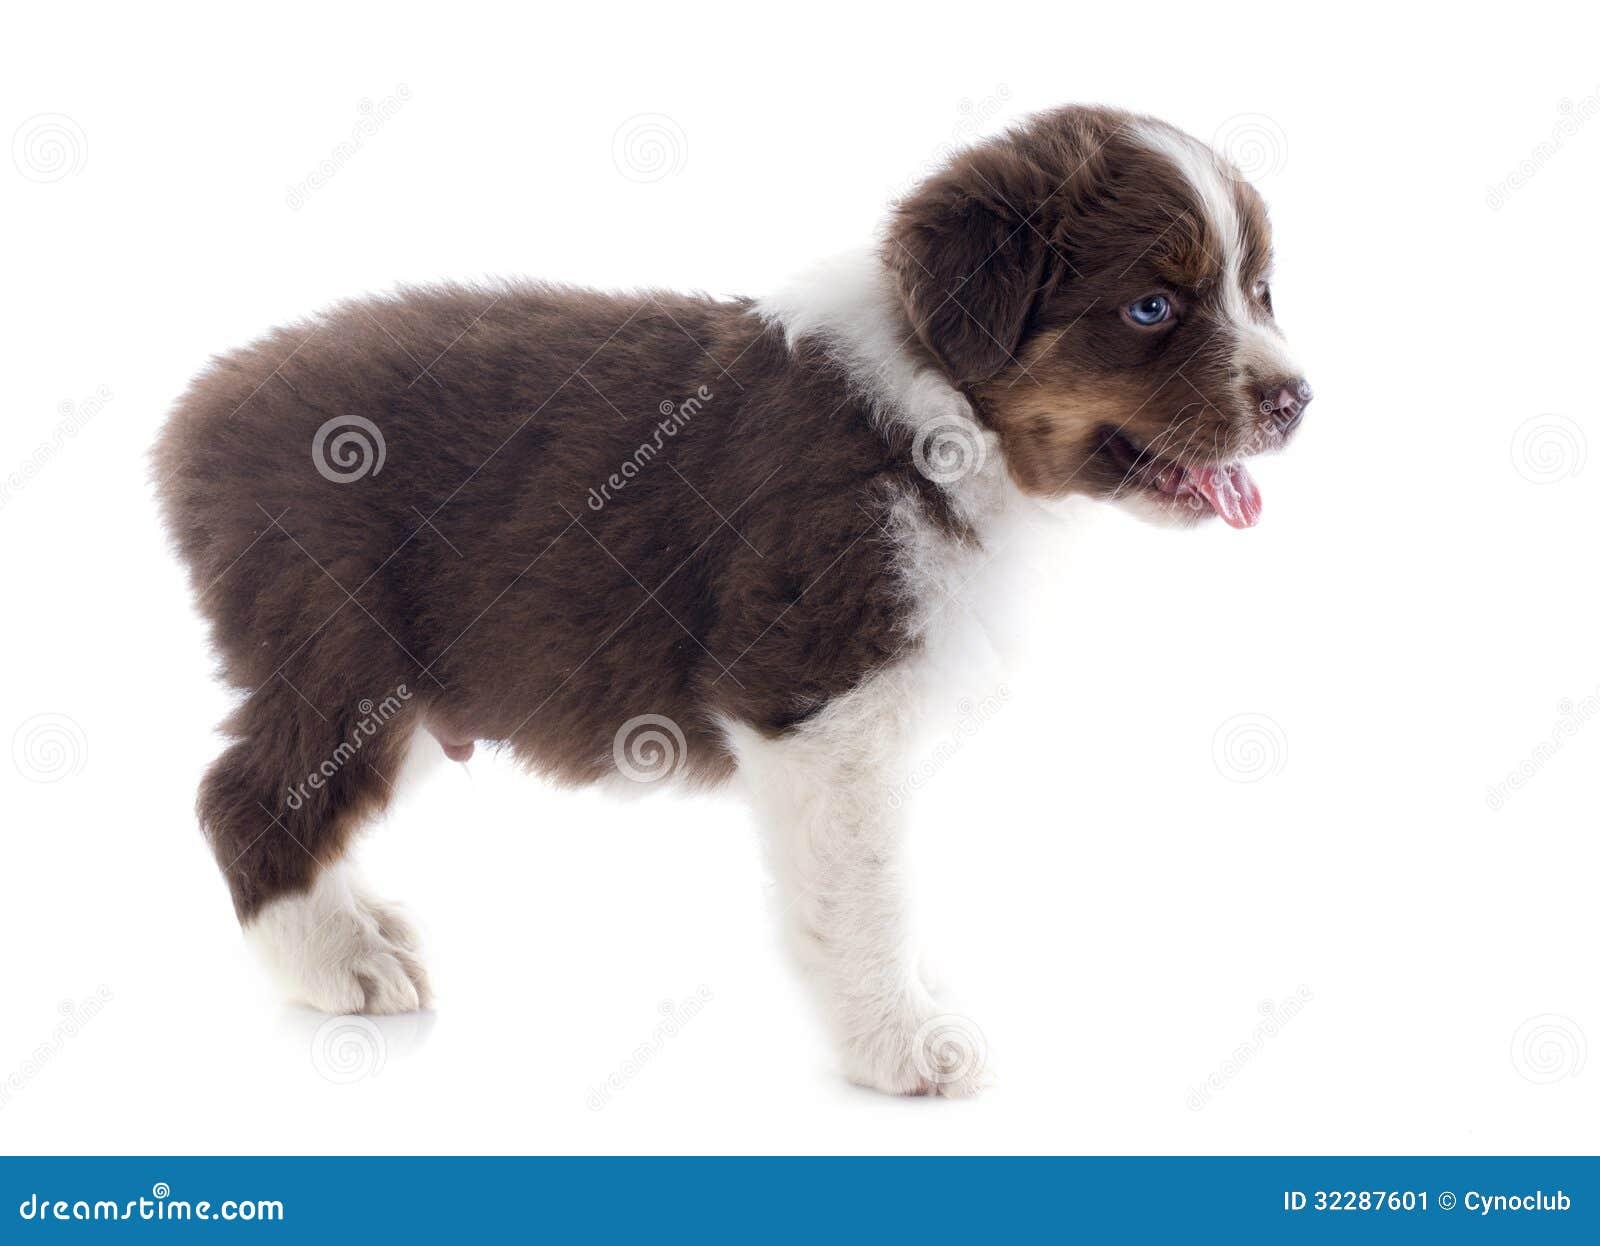 Puppy Australian Shepherd Stock Image - Image: 32287601